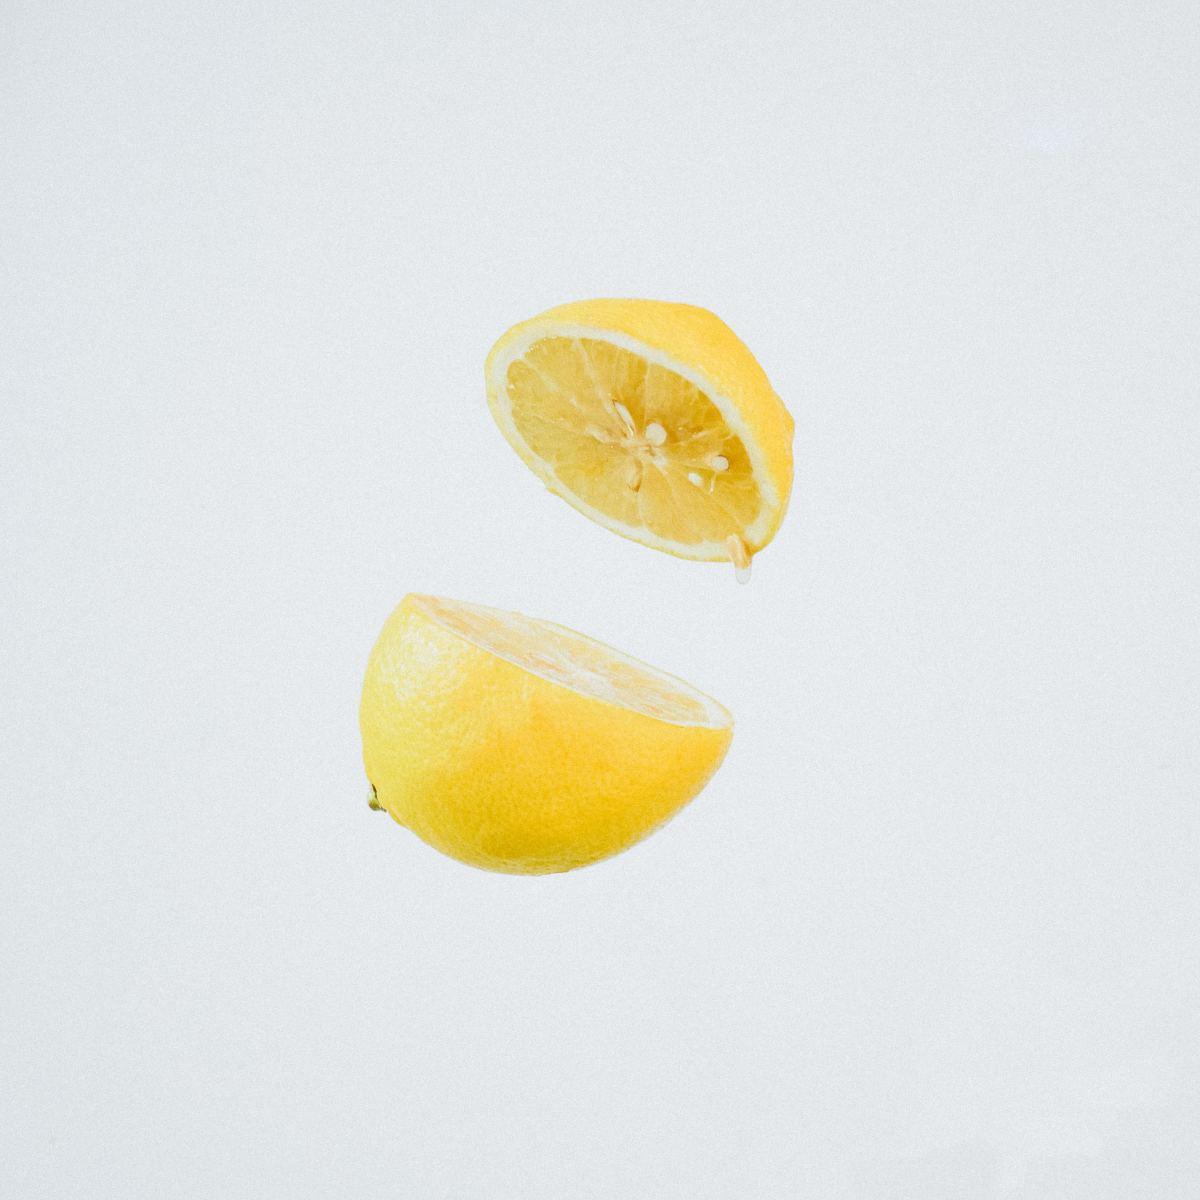 Lemon doesn't just lighten hair, it also strips it of excess oil!